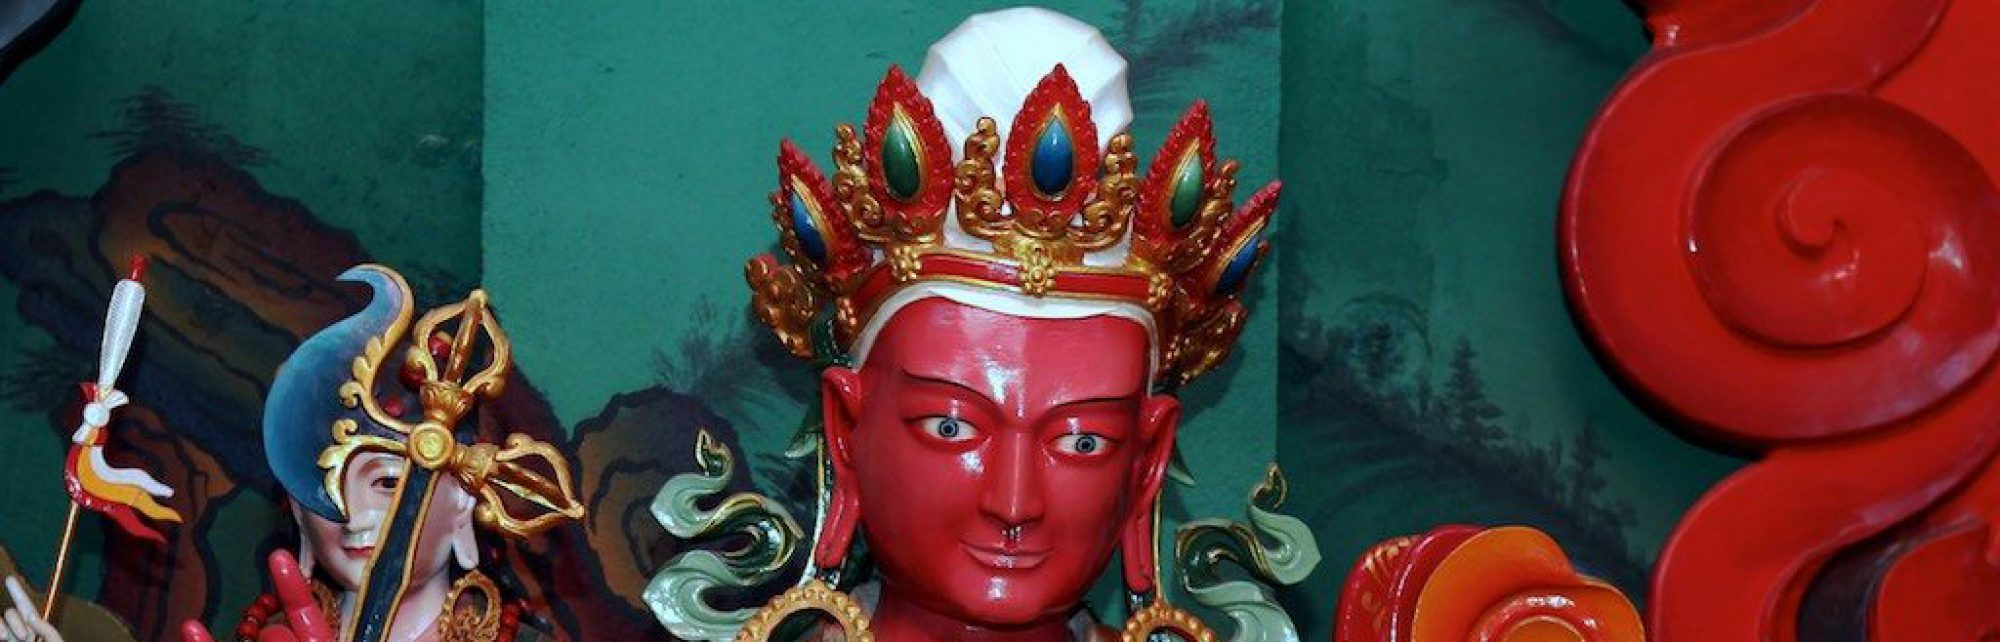 Buddha-Nature.com